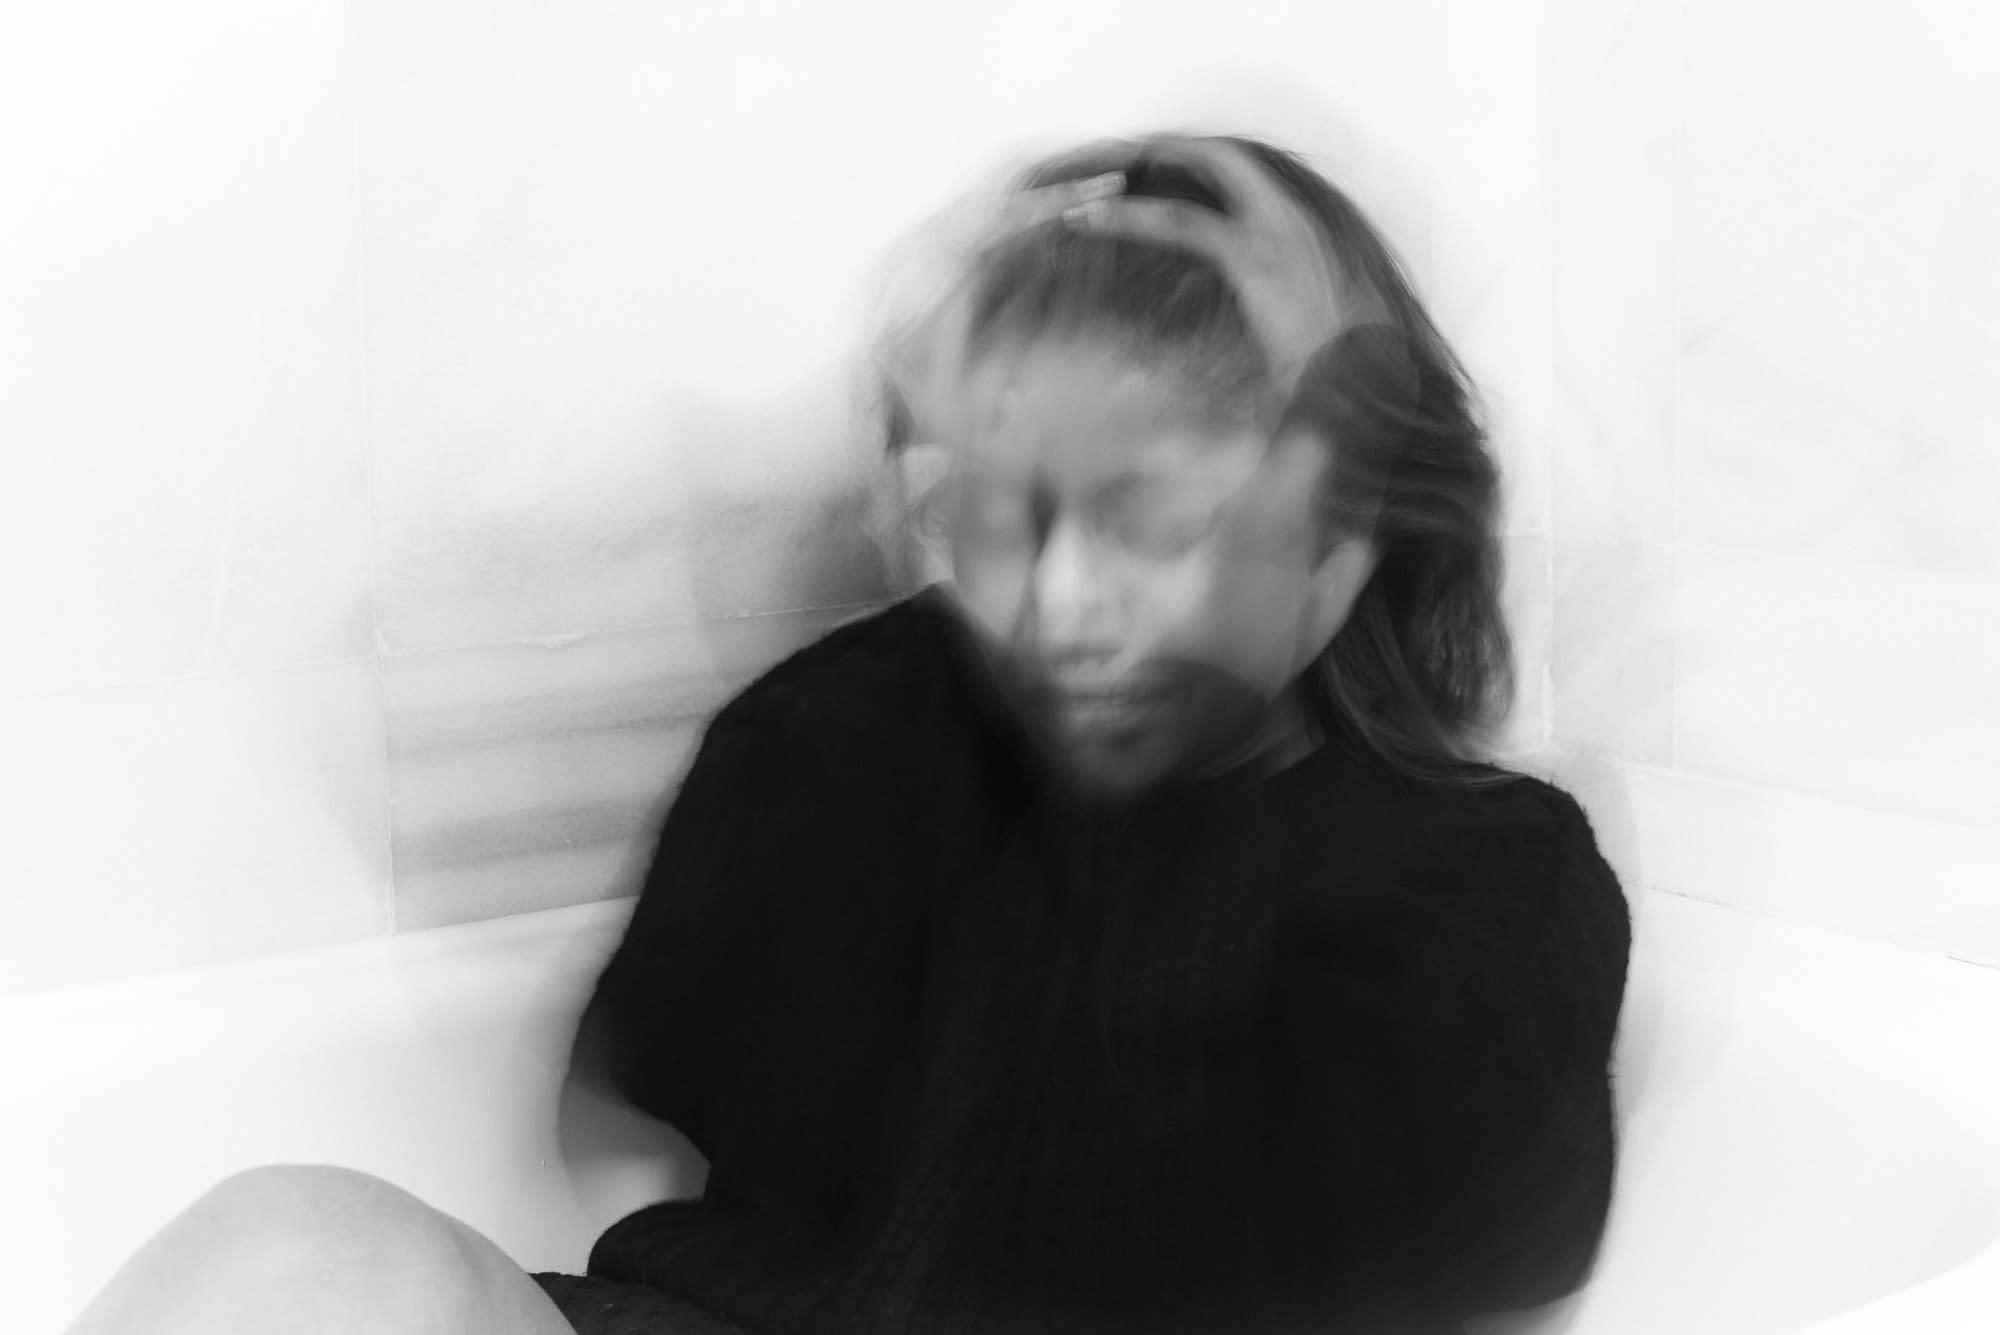 Lucille_Galleli_Portraiture_2017_2848